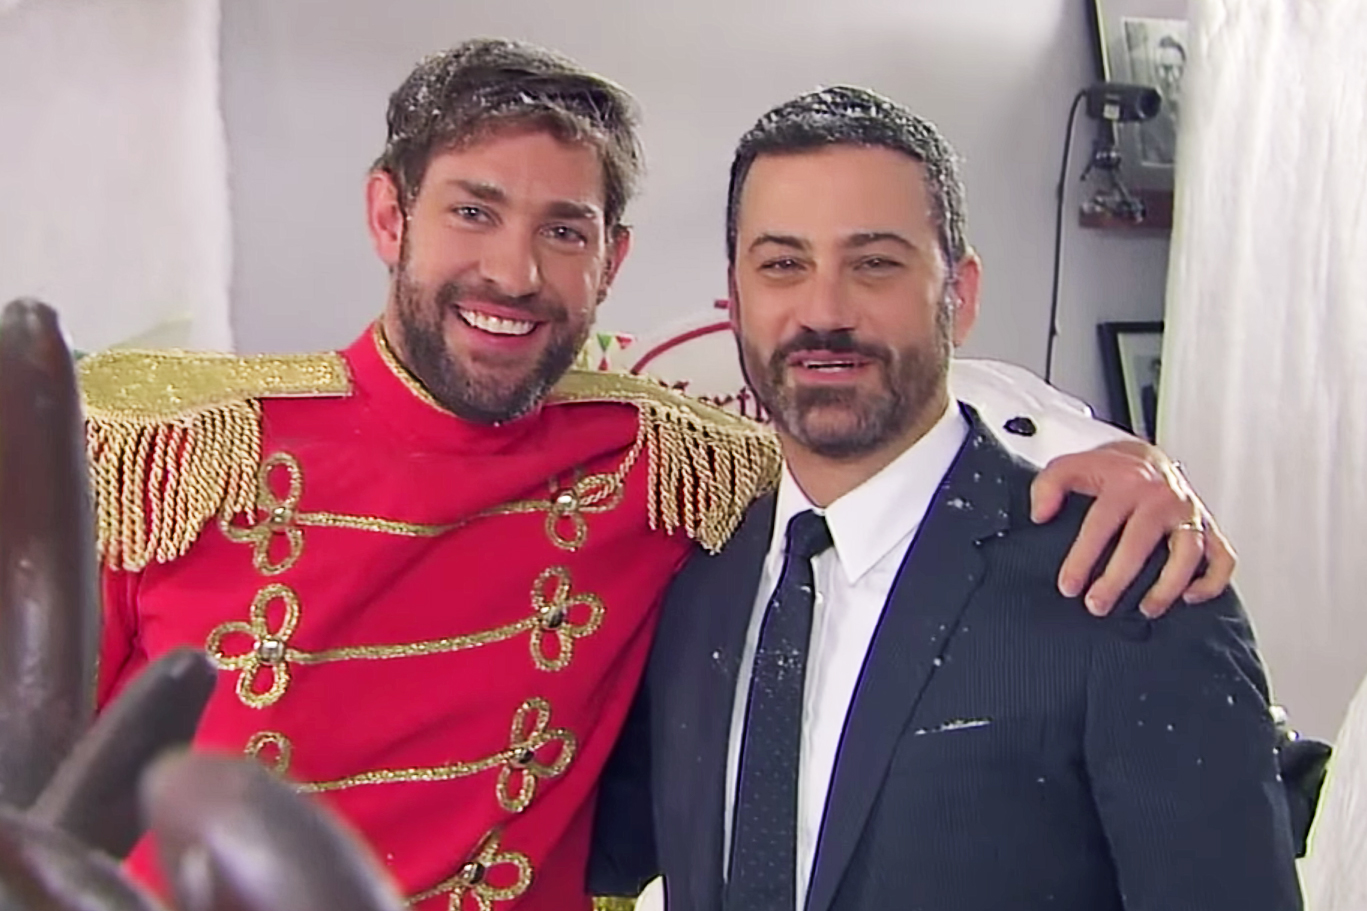 The John Krasinki and Jimmy Kimmel Prank War Continues